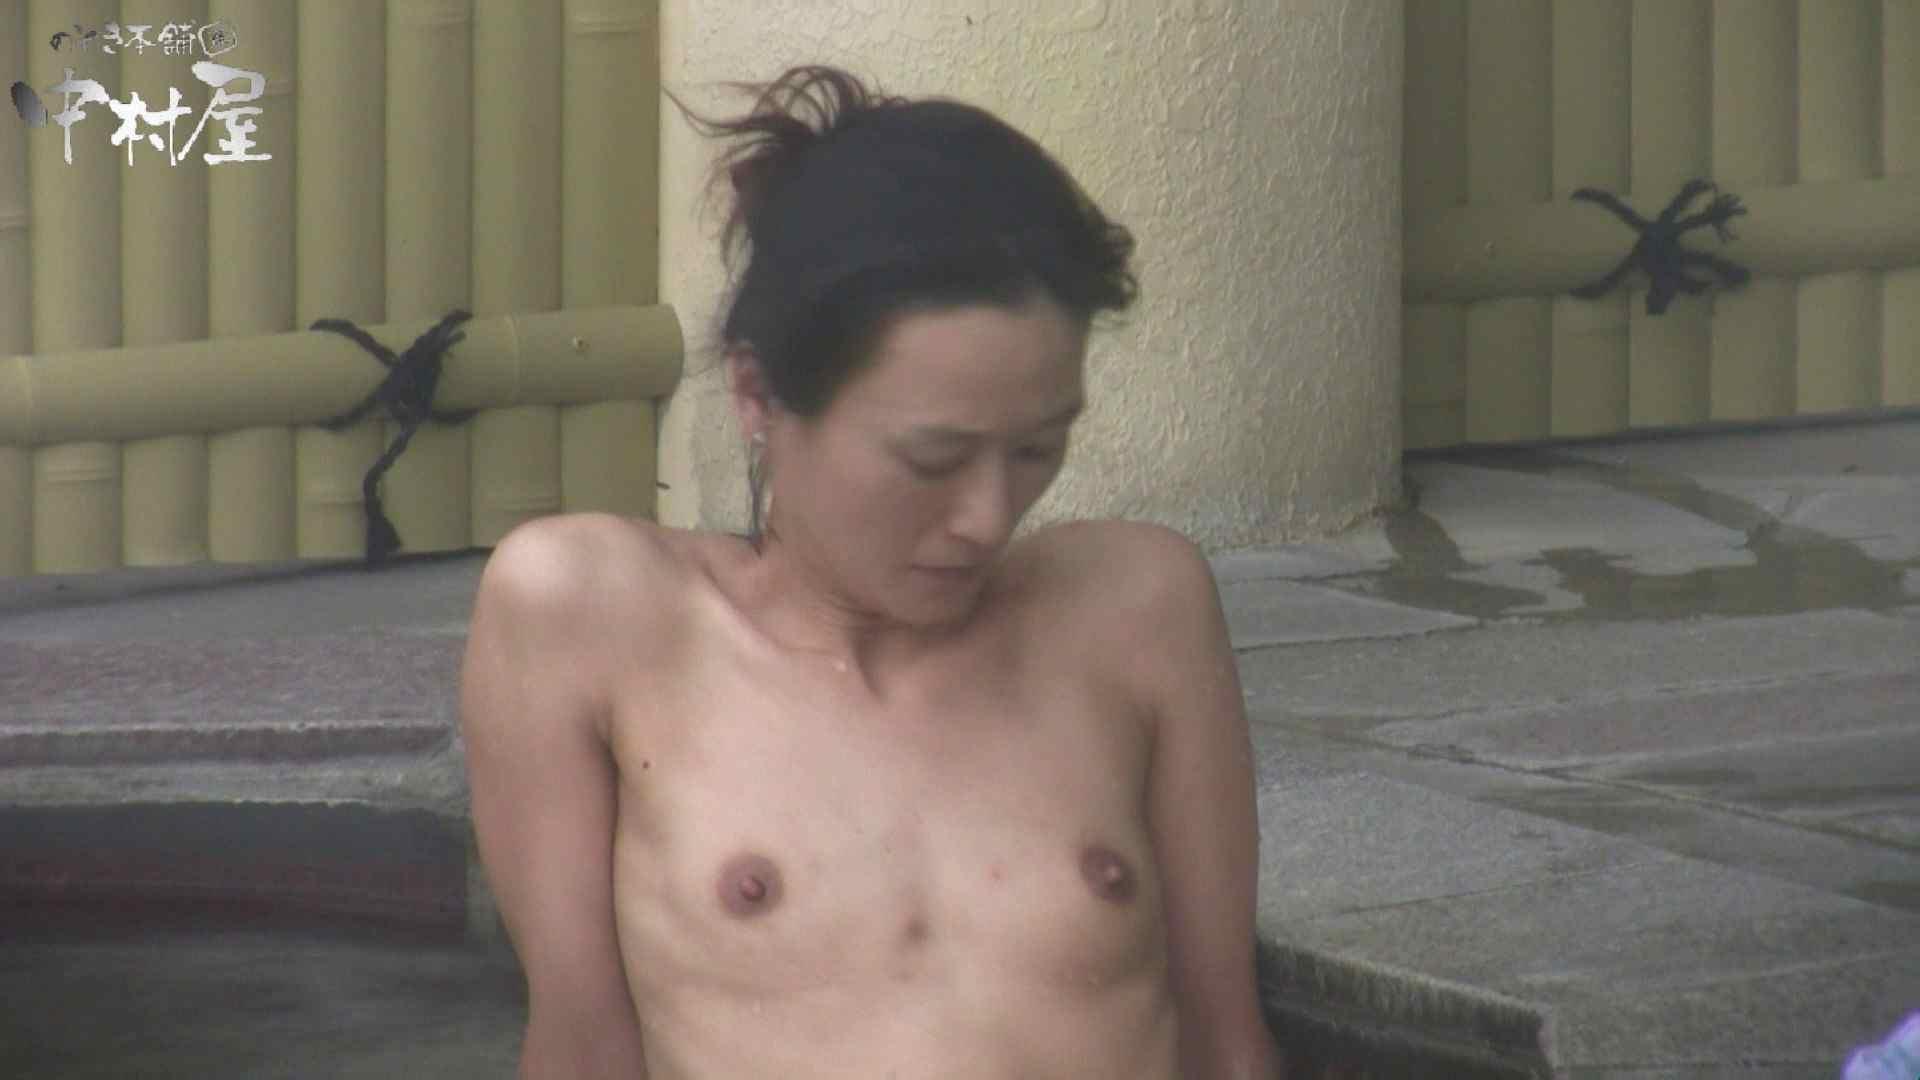 Aquaな露天風呂Vol.928 露天風呂突入 | 盗撮師作品  72pic 34